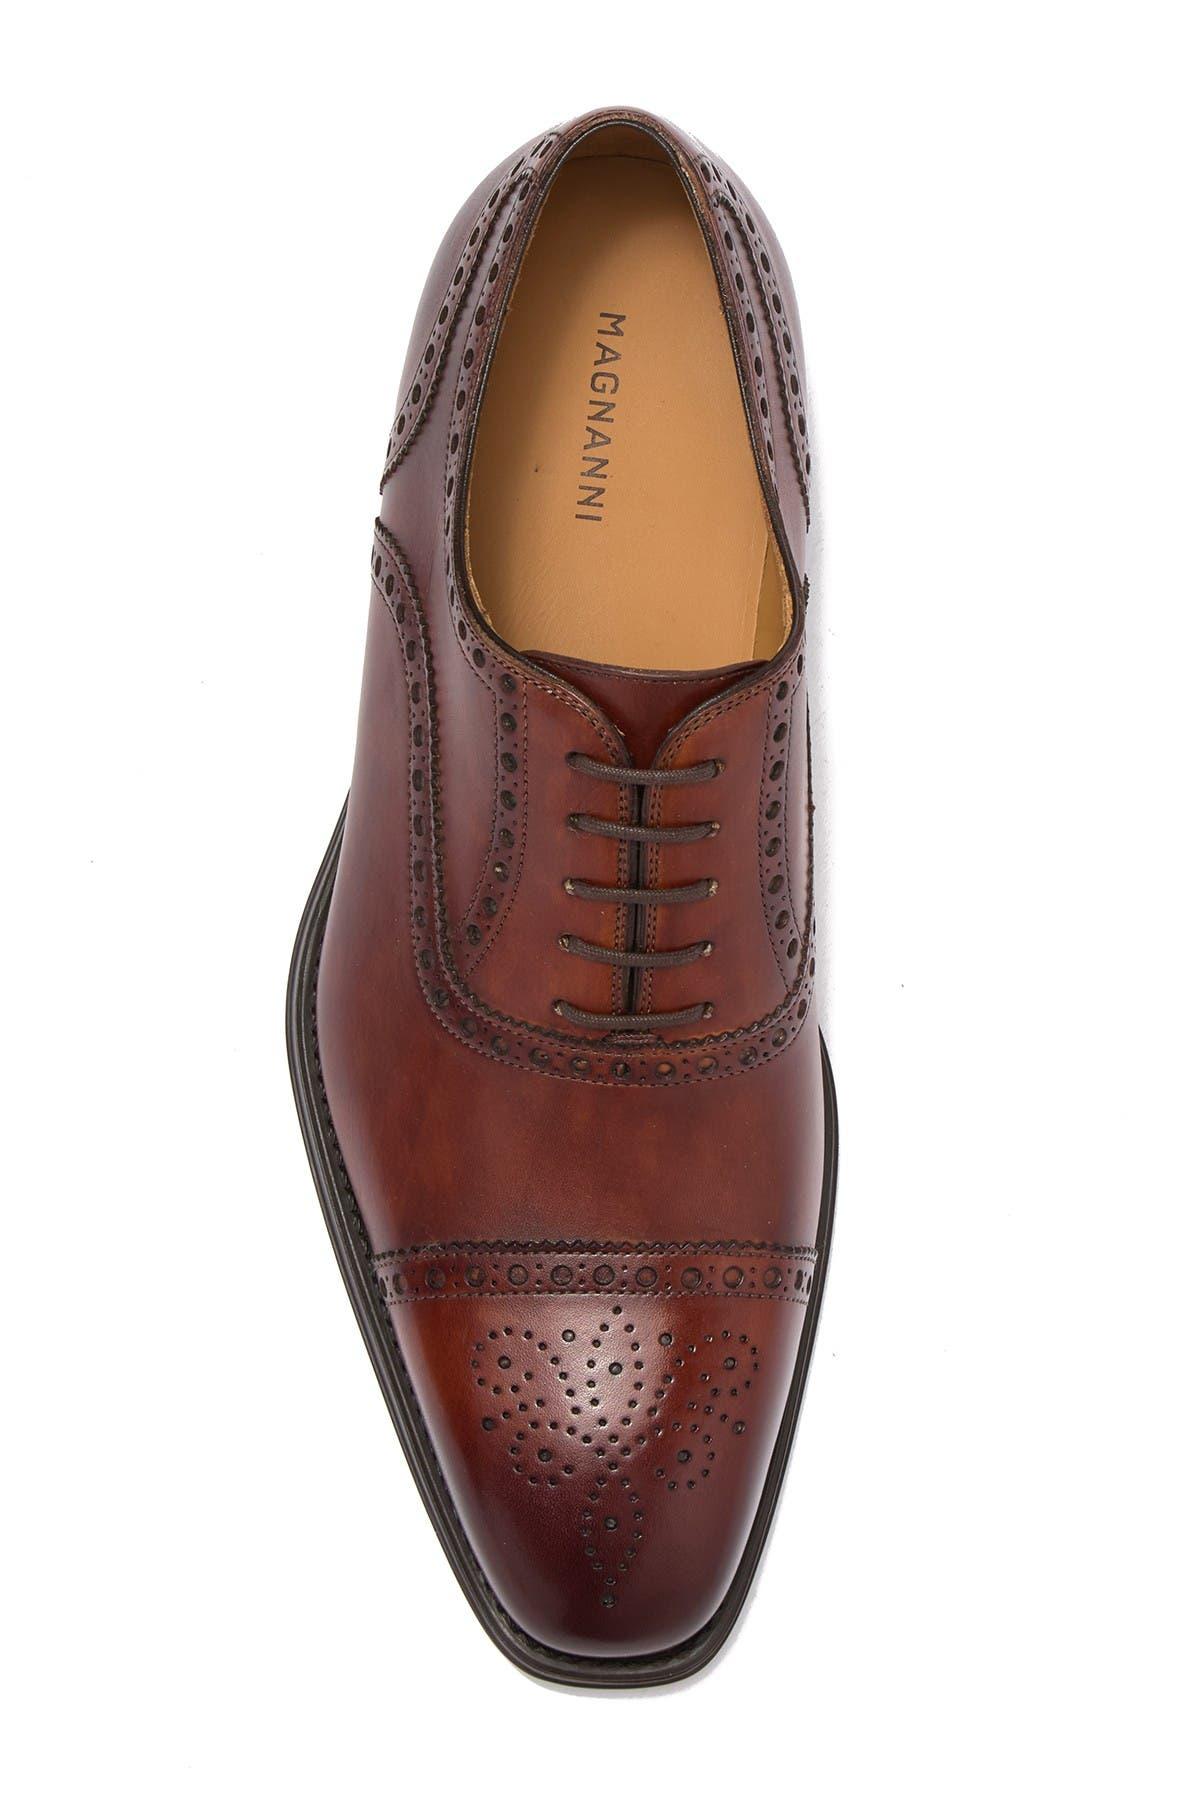 Magnanni | Cieza Leather Cap Toe Oxford